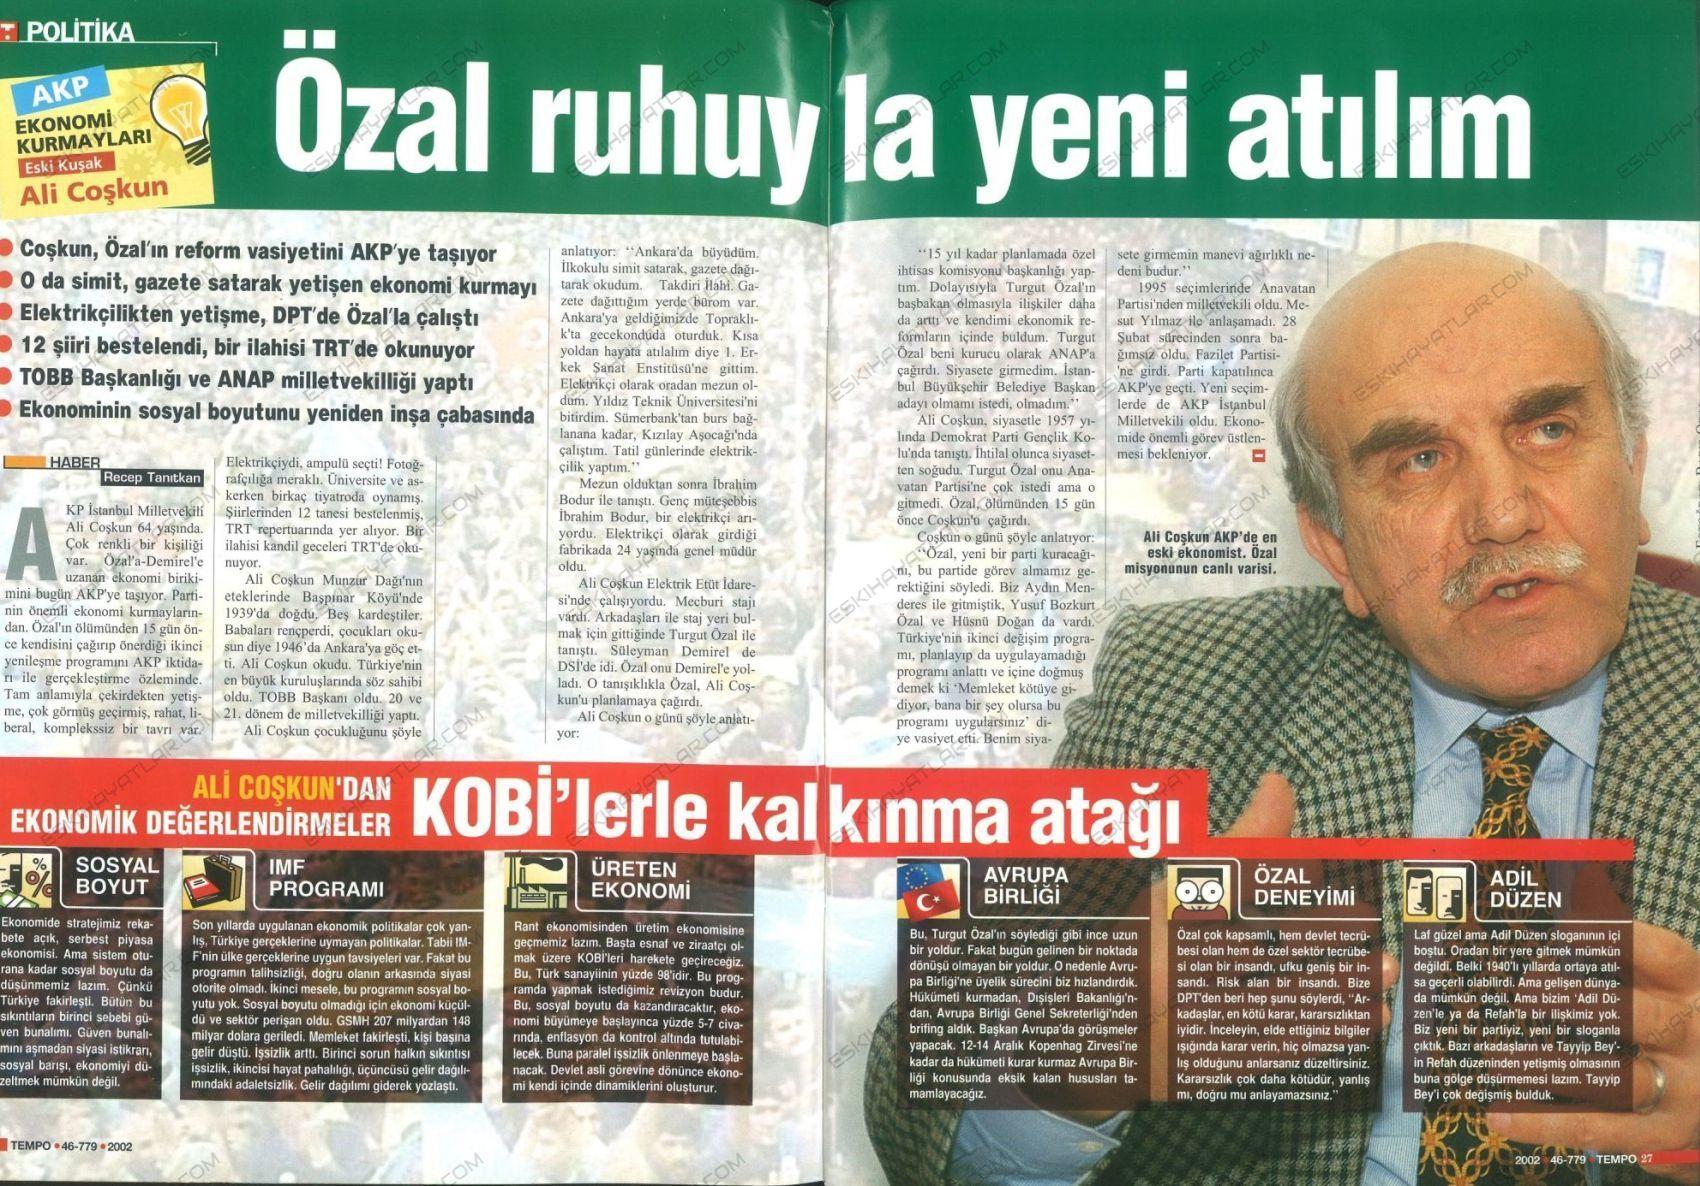 0355-turkiyenin-yeni-umudu-ak-parti-2002-tempo-dergisi-recep-tayyip-erdogan (4)